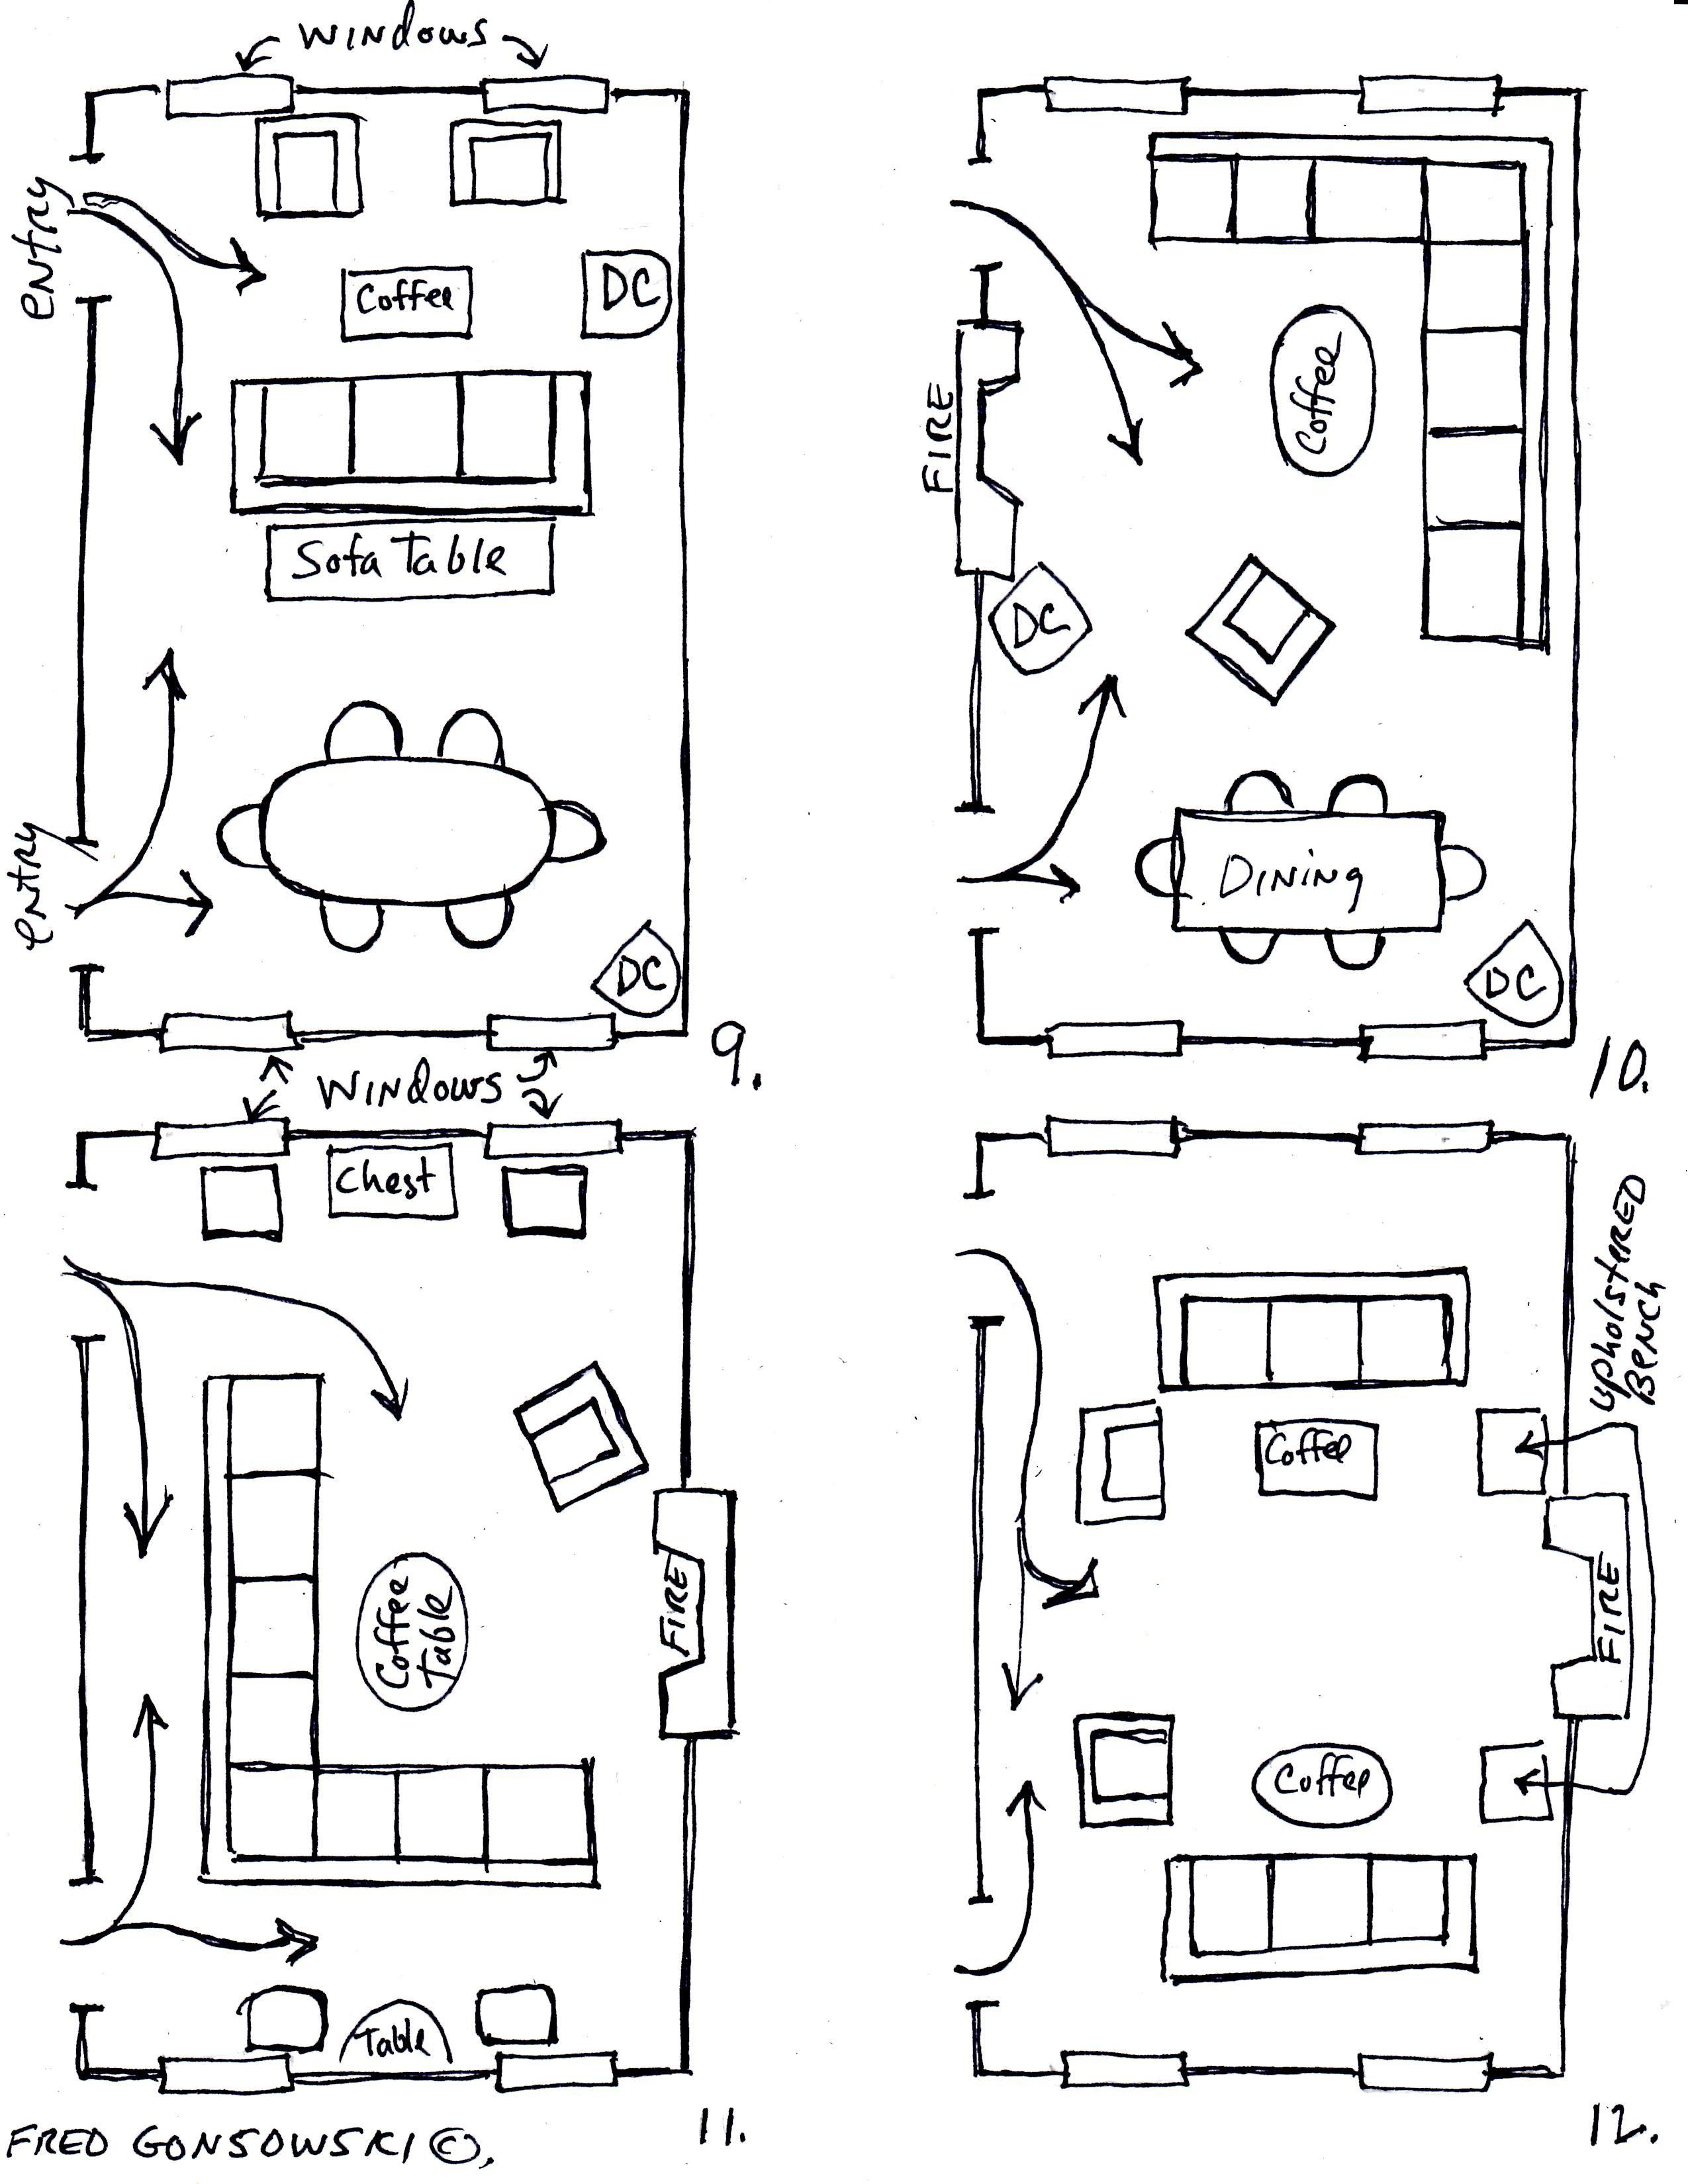 Furniture Arranging One Room Gt 12 Ways